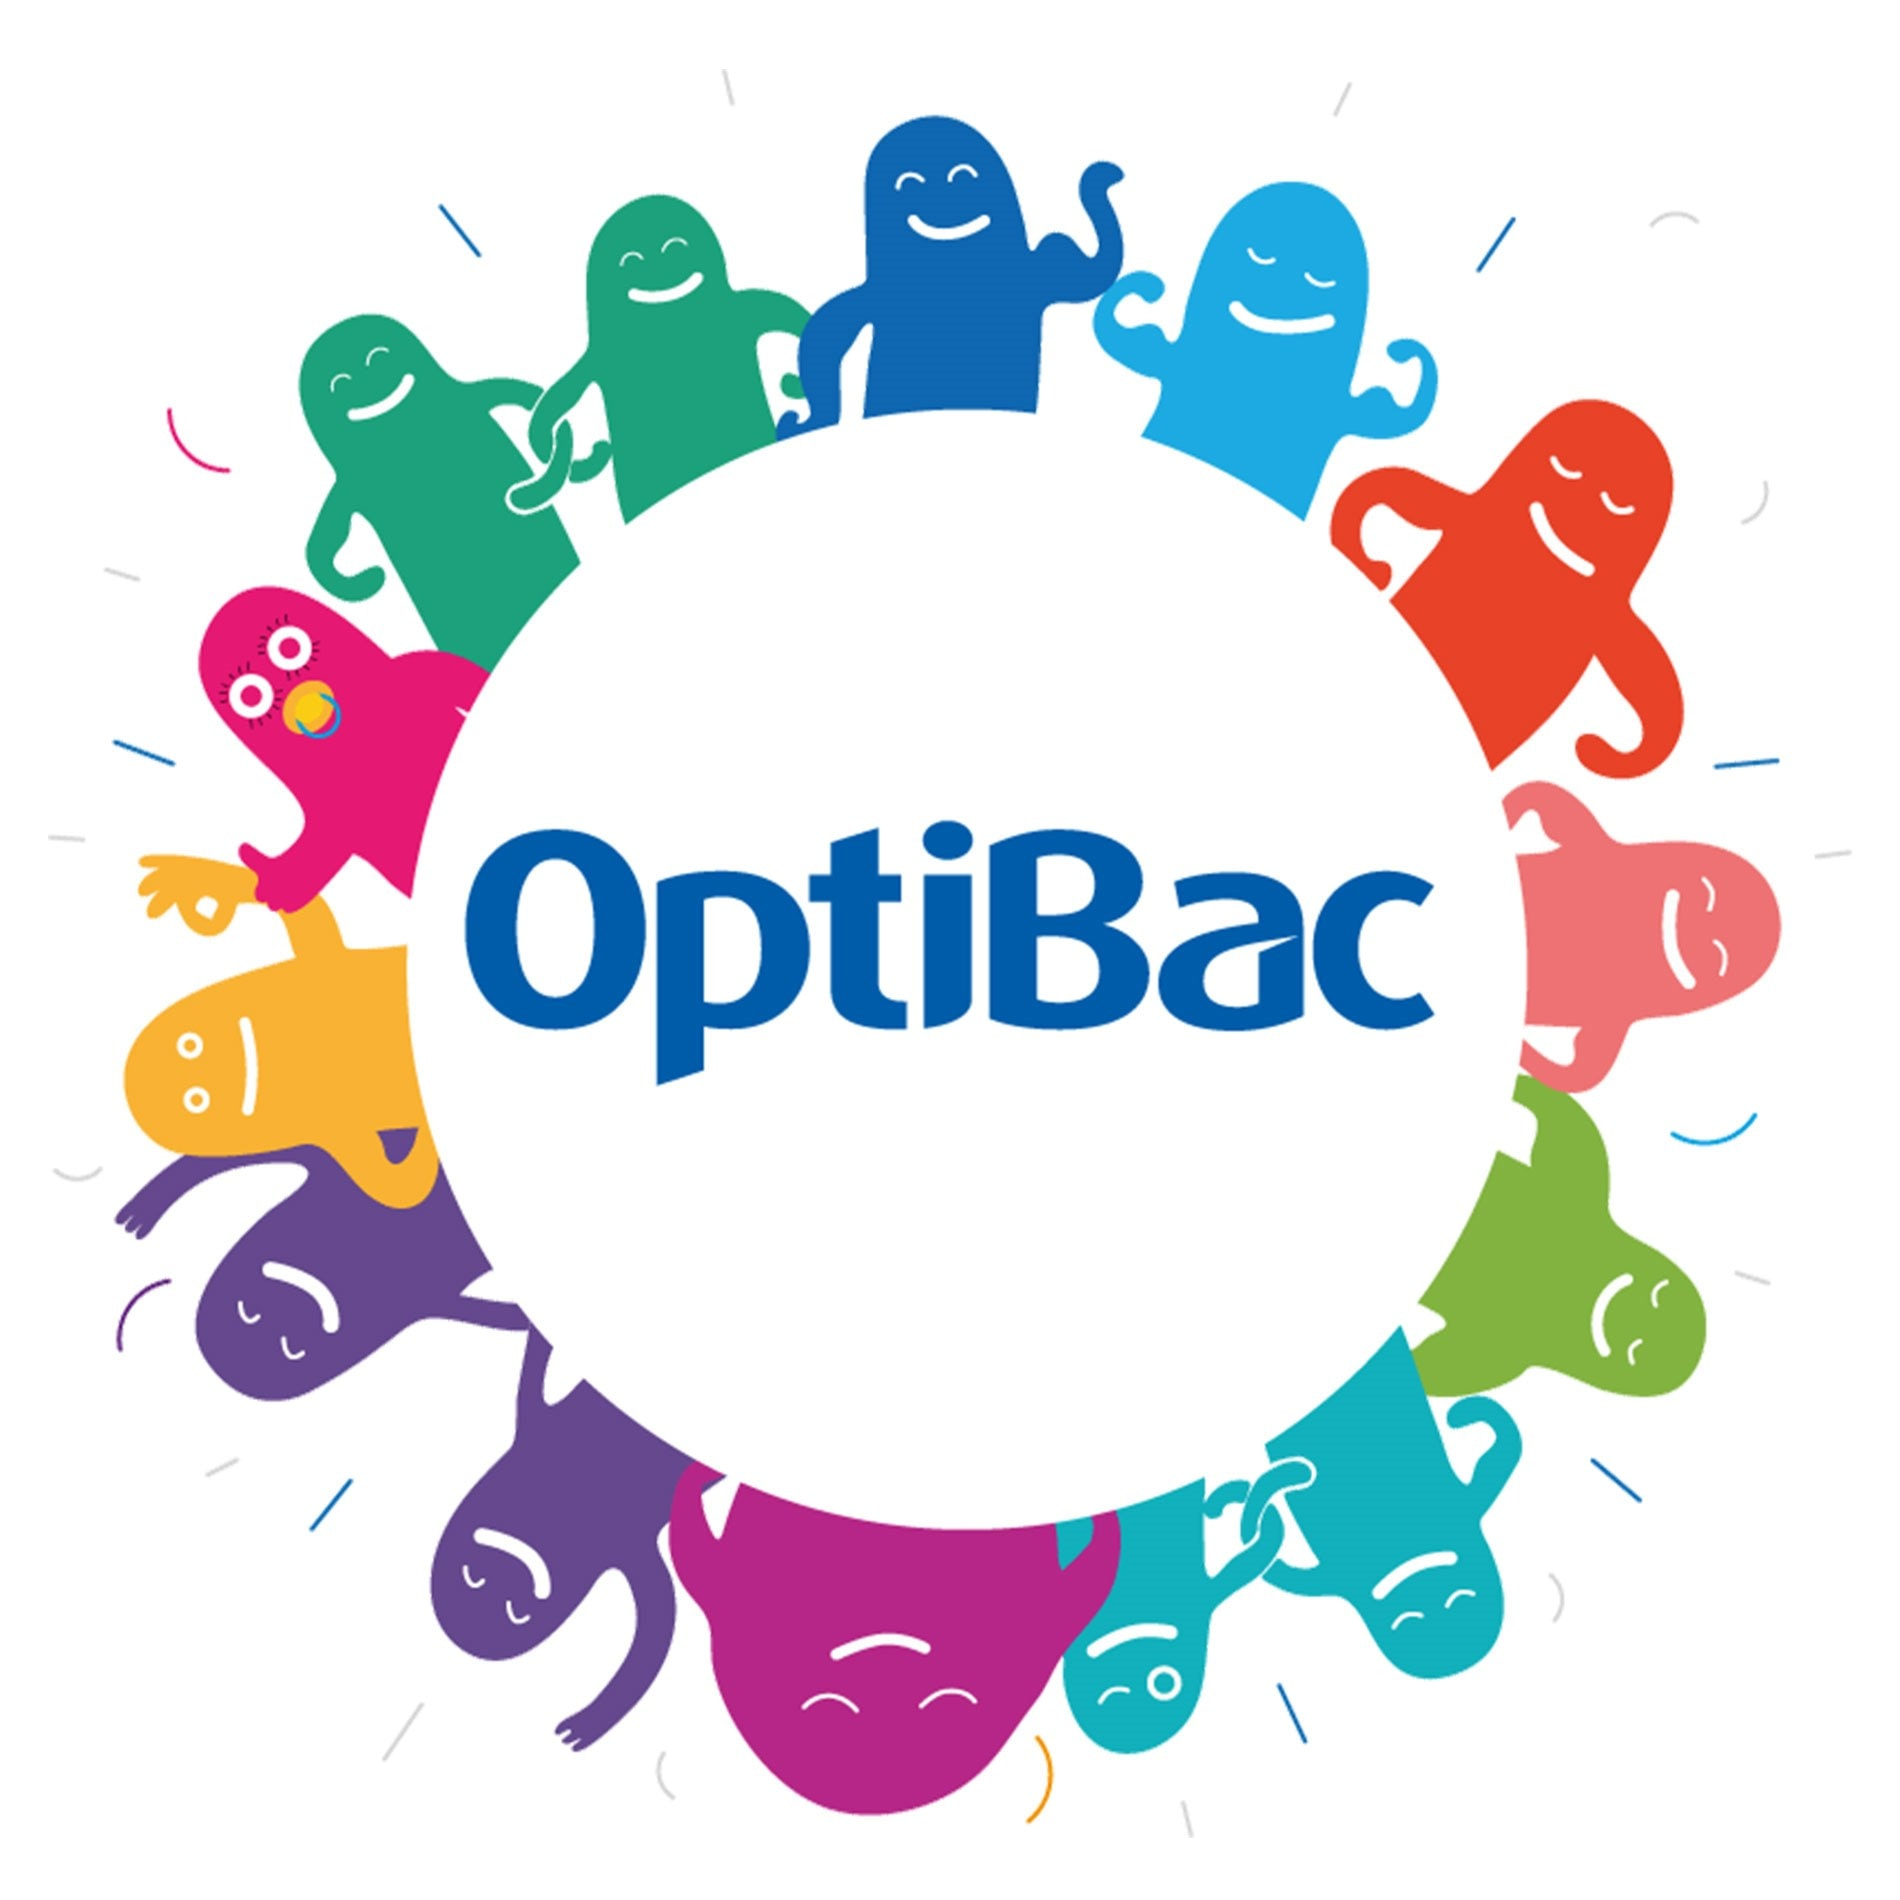 About OptiBac Probiotics